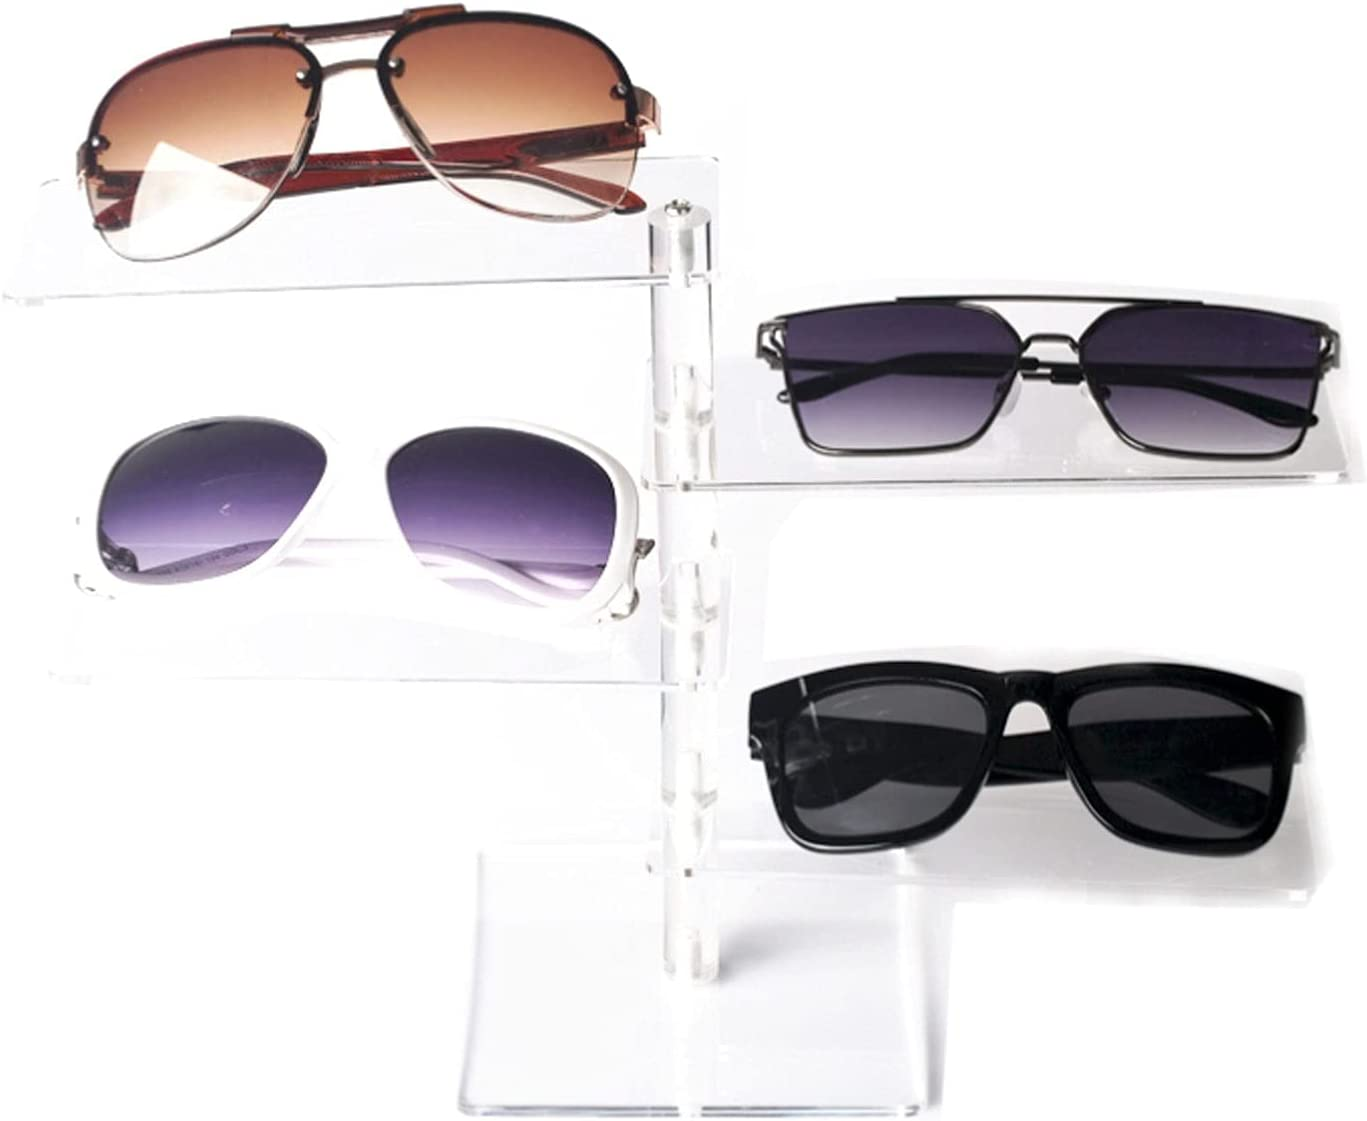 Excellence CJshop Sunglasses Rack Regular discount Holder 4 Frame St Eyeglasses Acrylic Tier